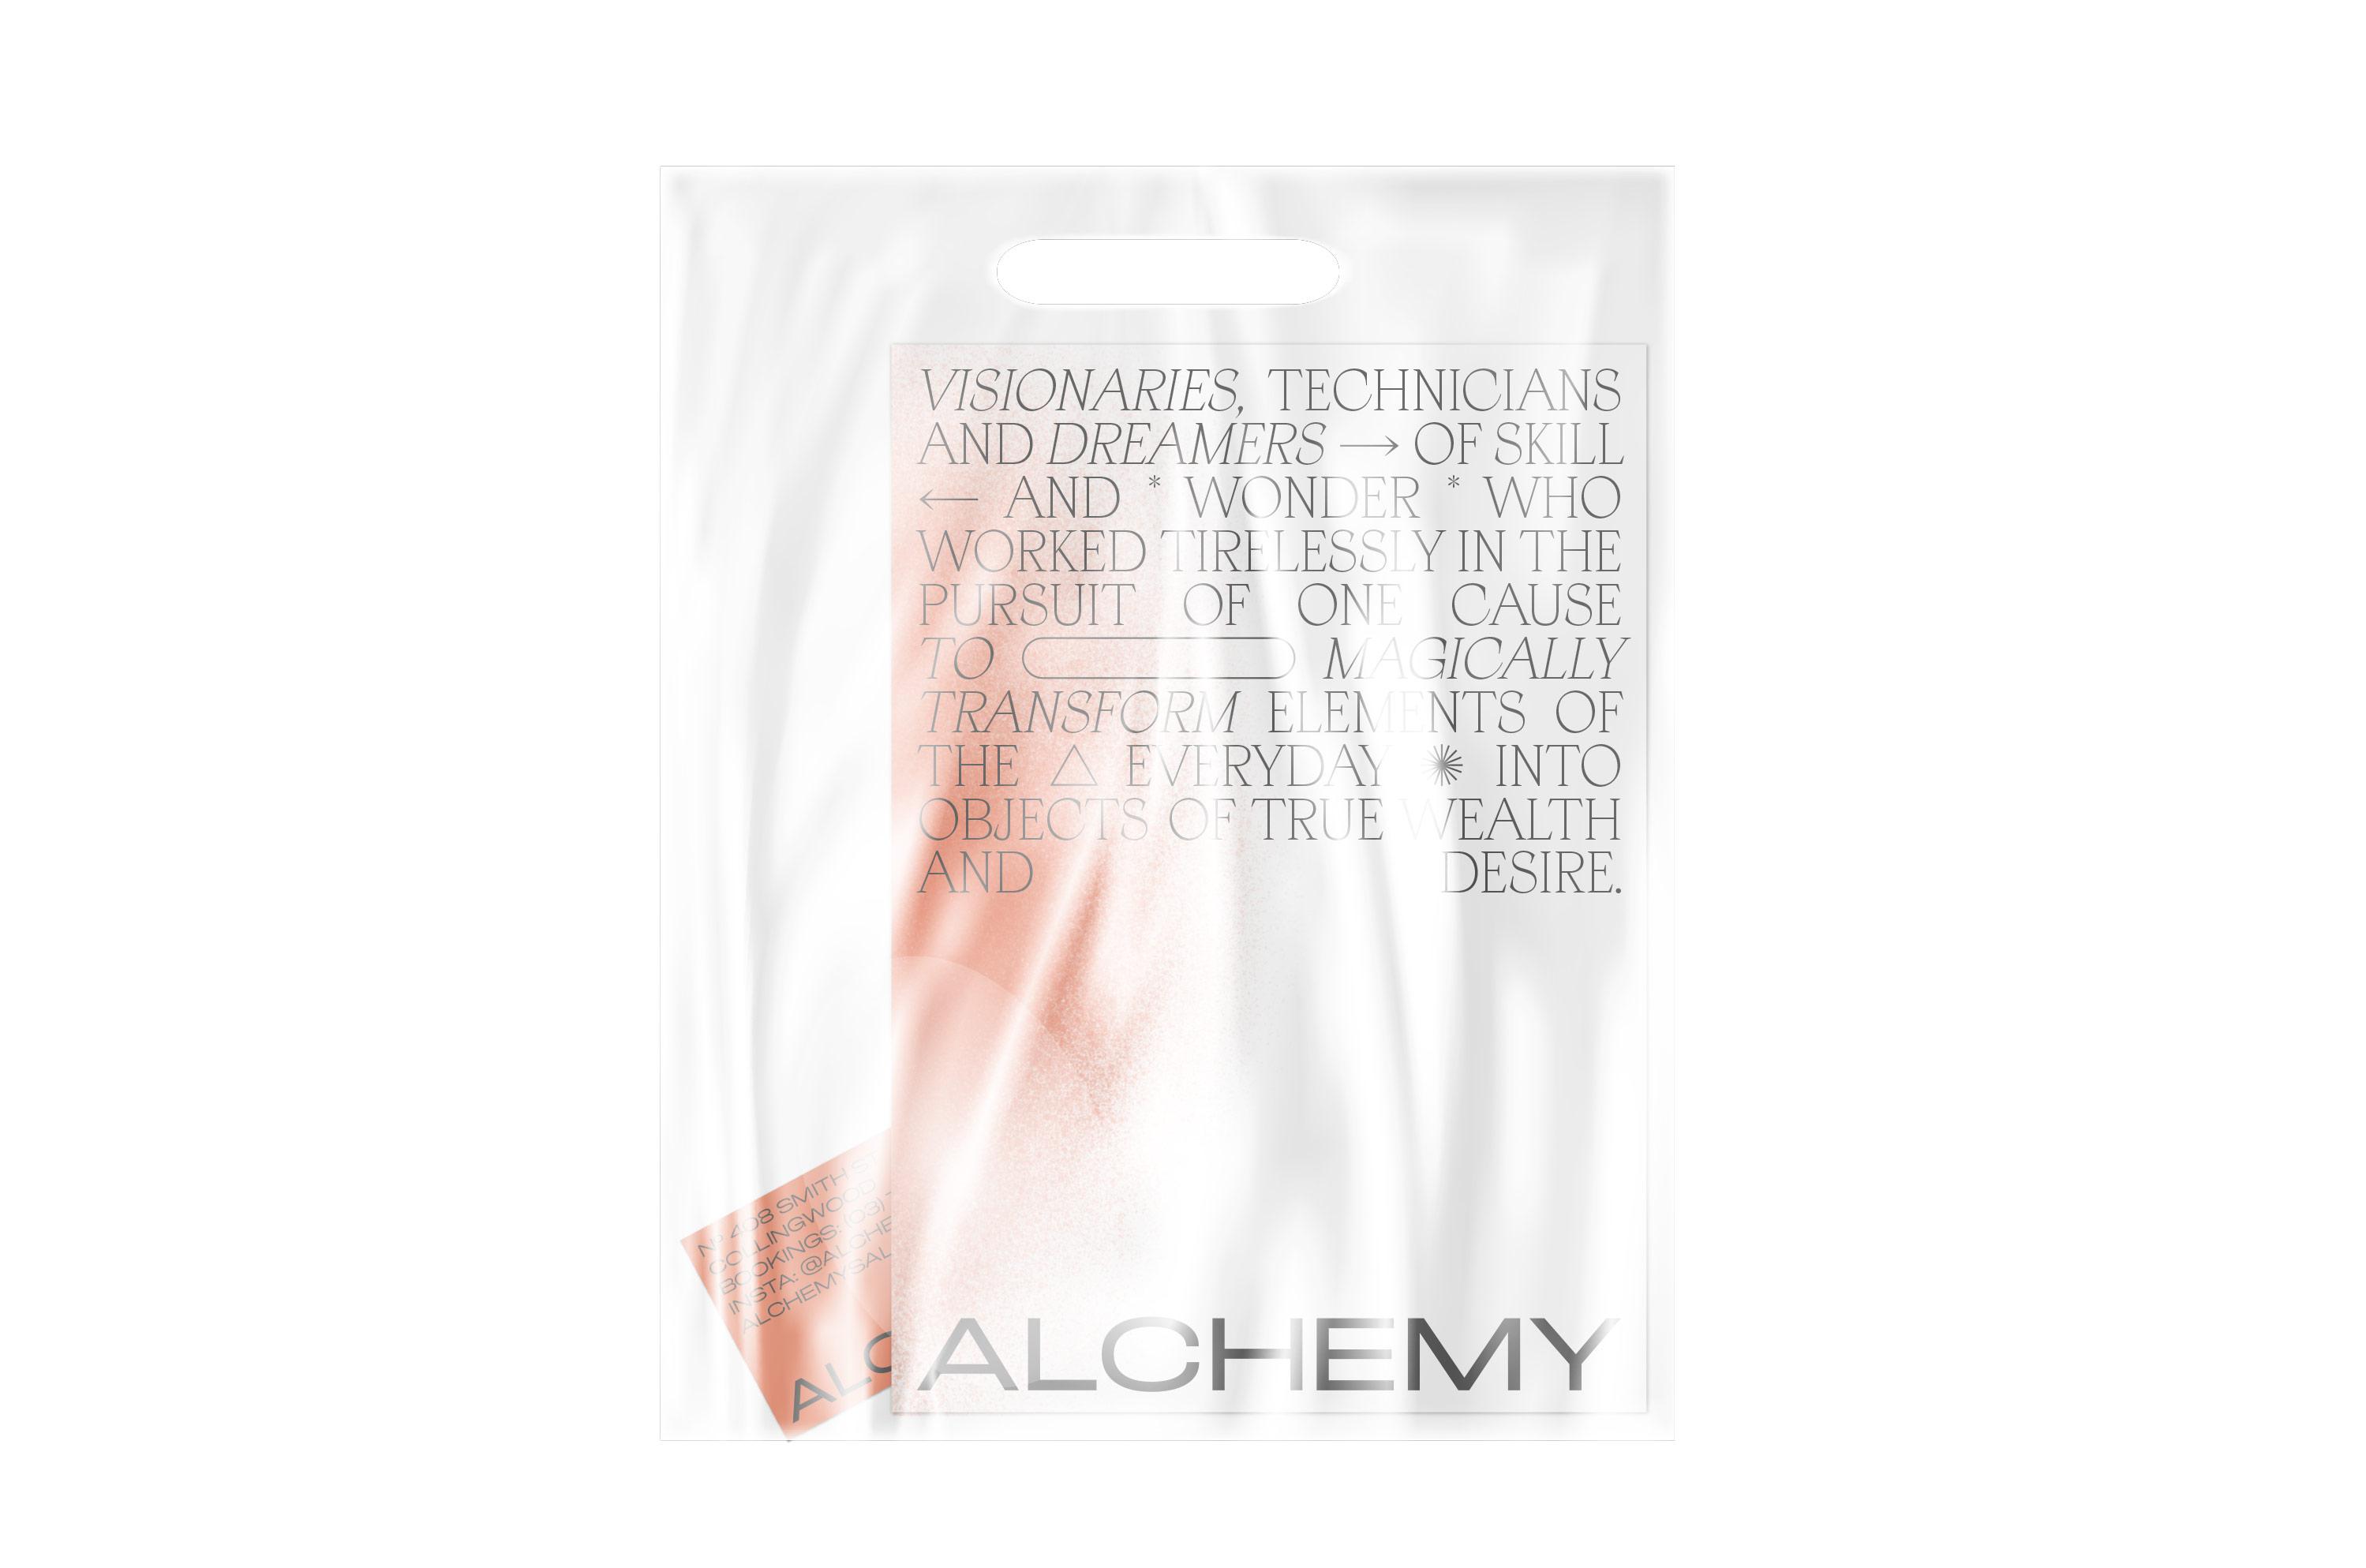 Alchemy Hair Salon Branding by Studio Work